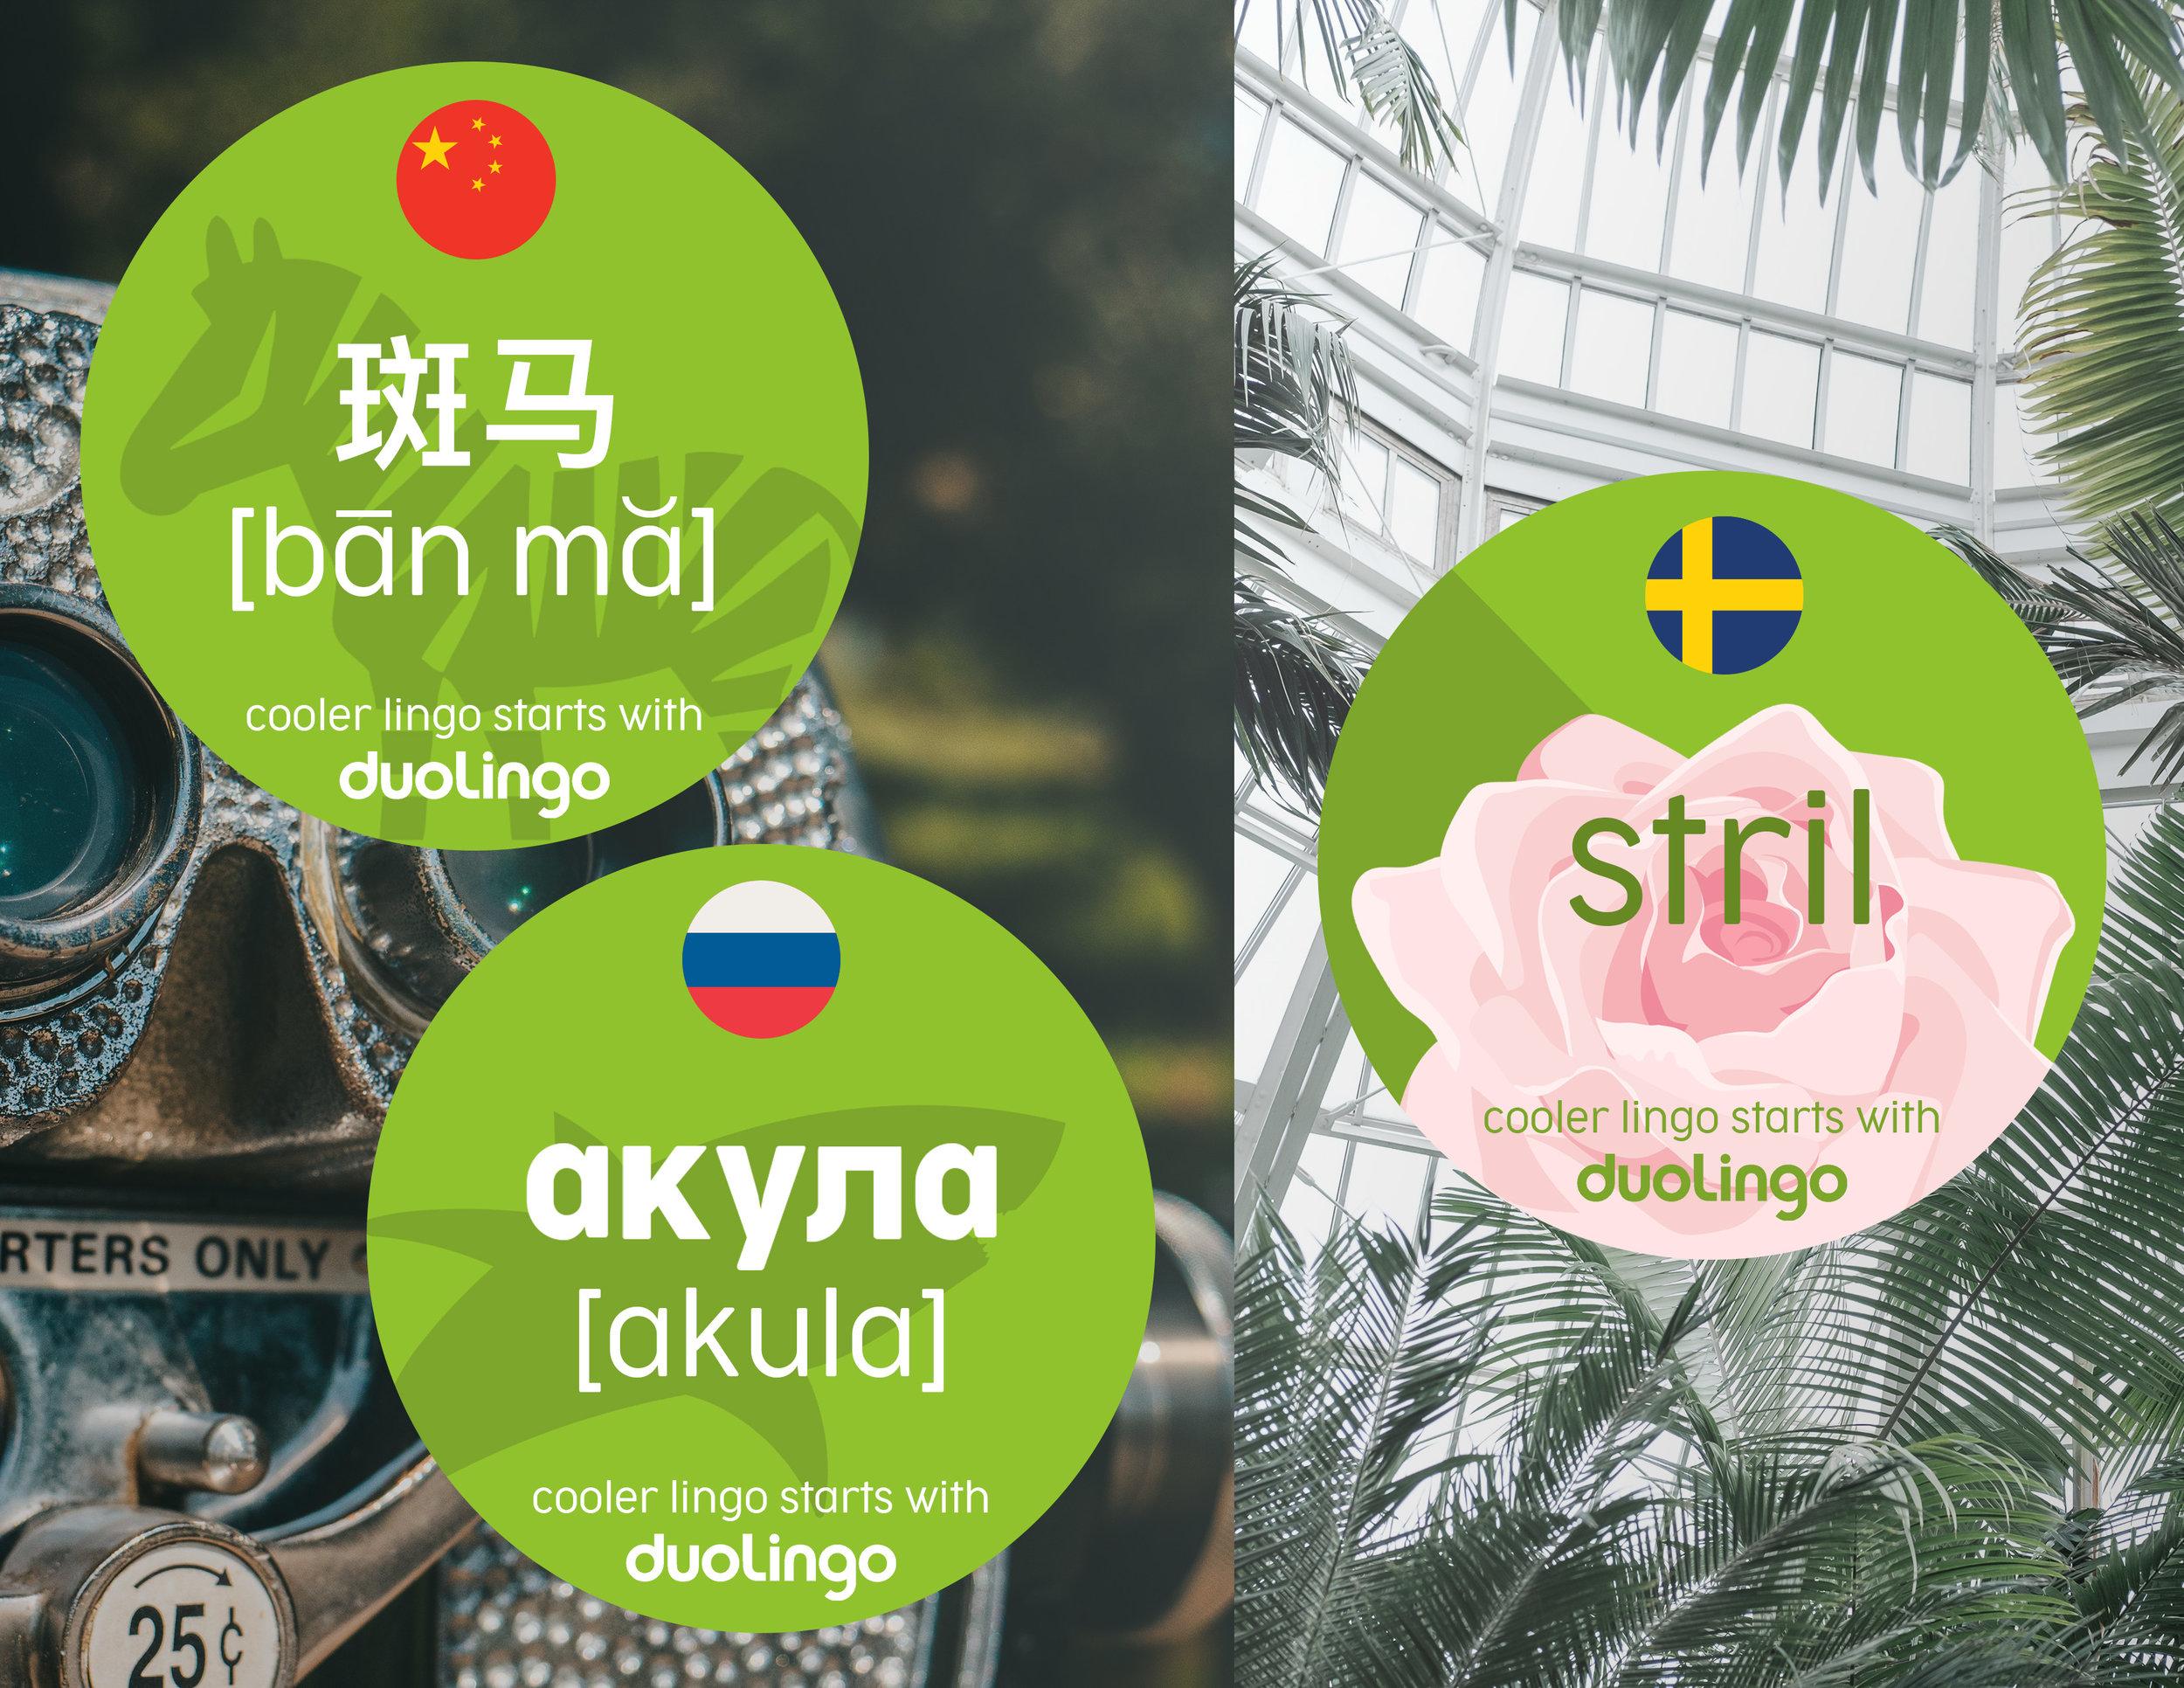 zoo-garden-signs.jpg